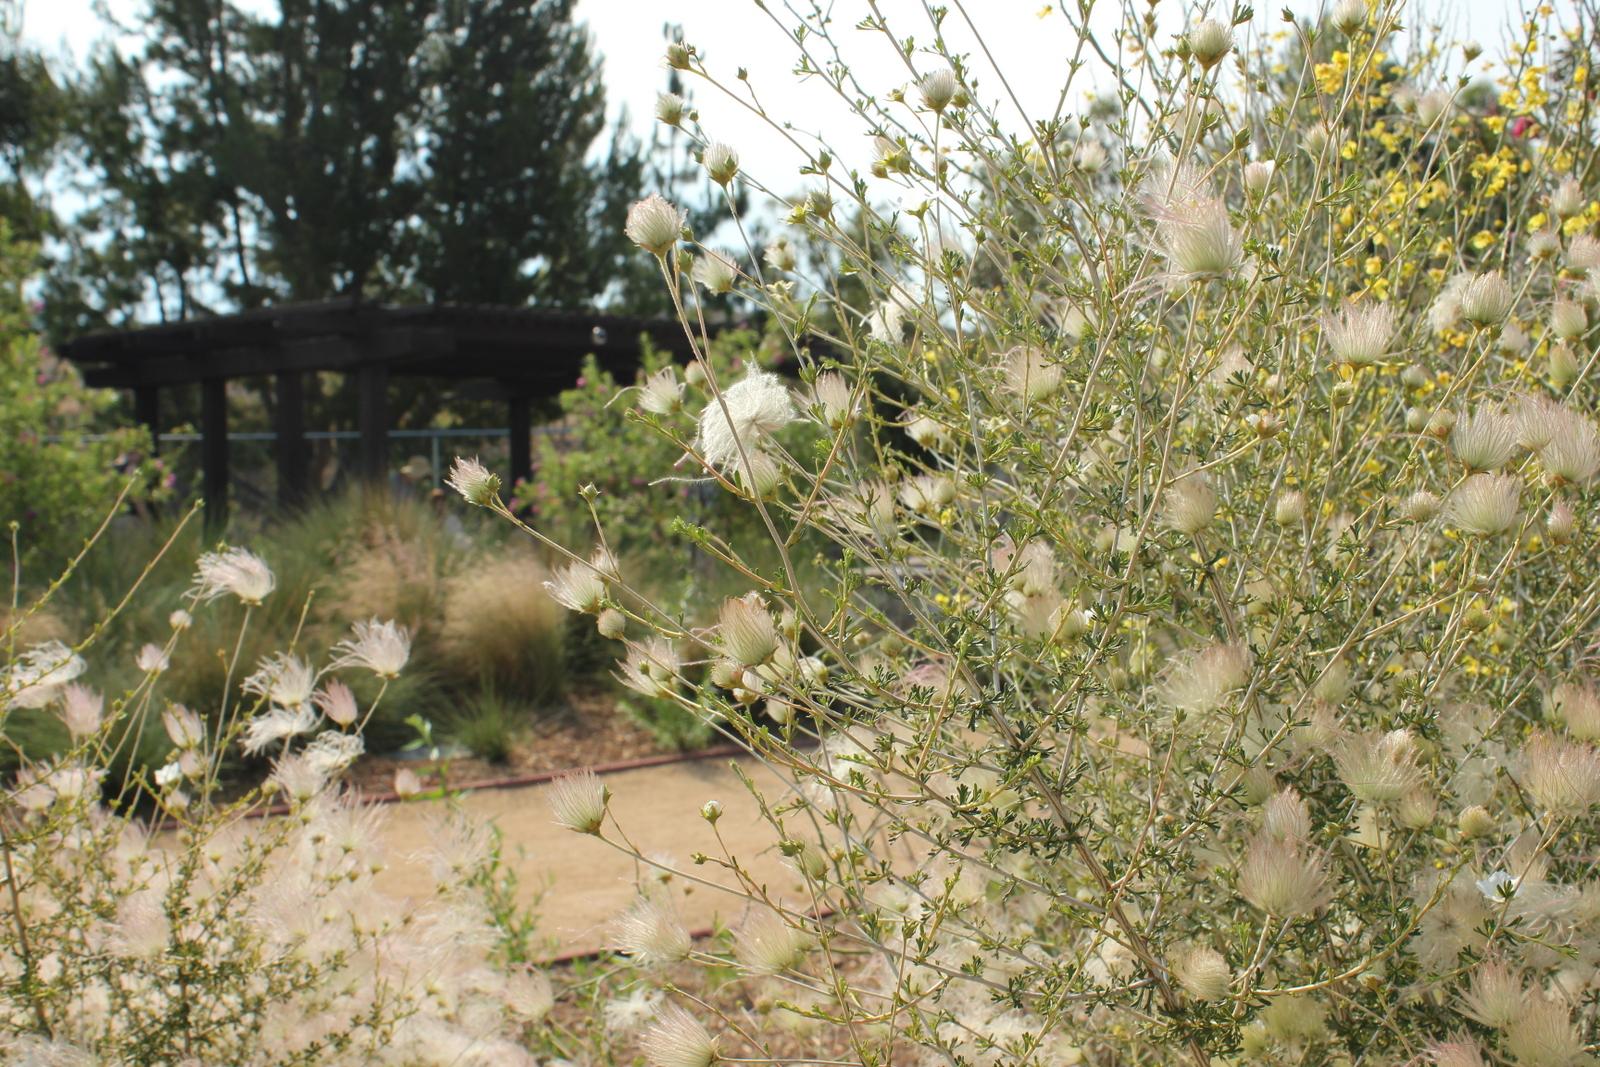 Apache plume in the desert habitat.